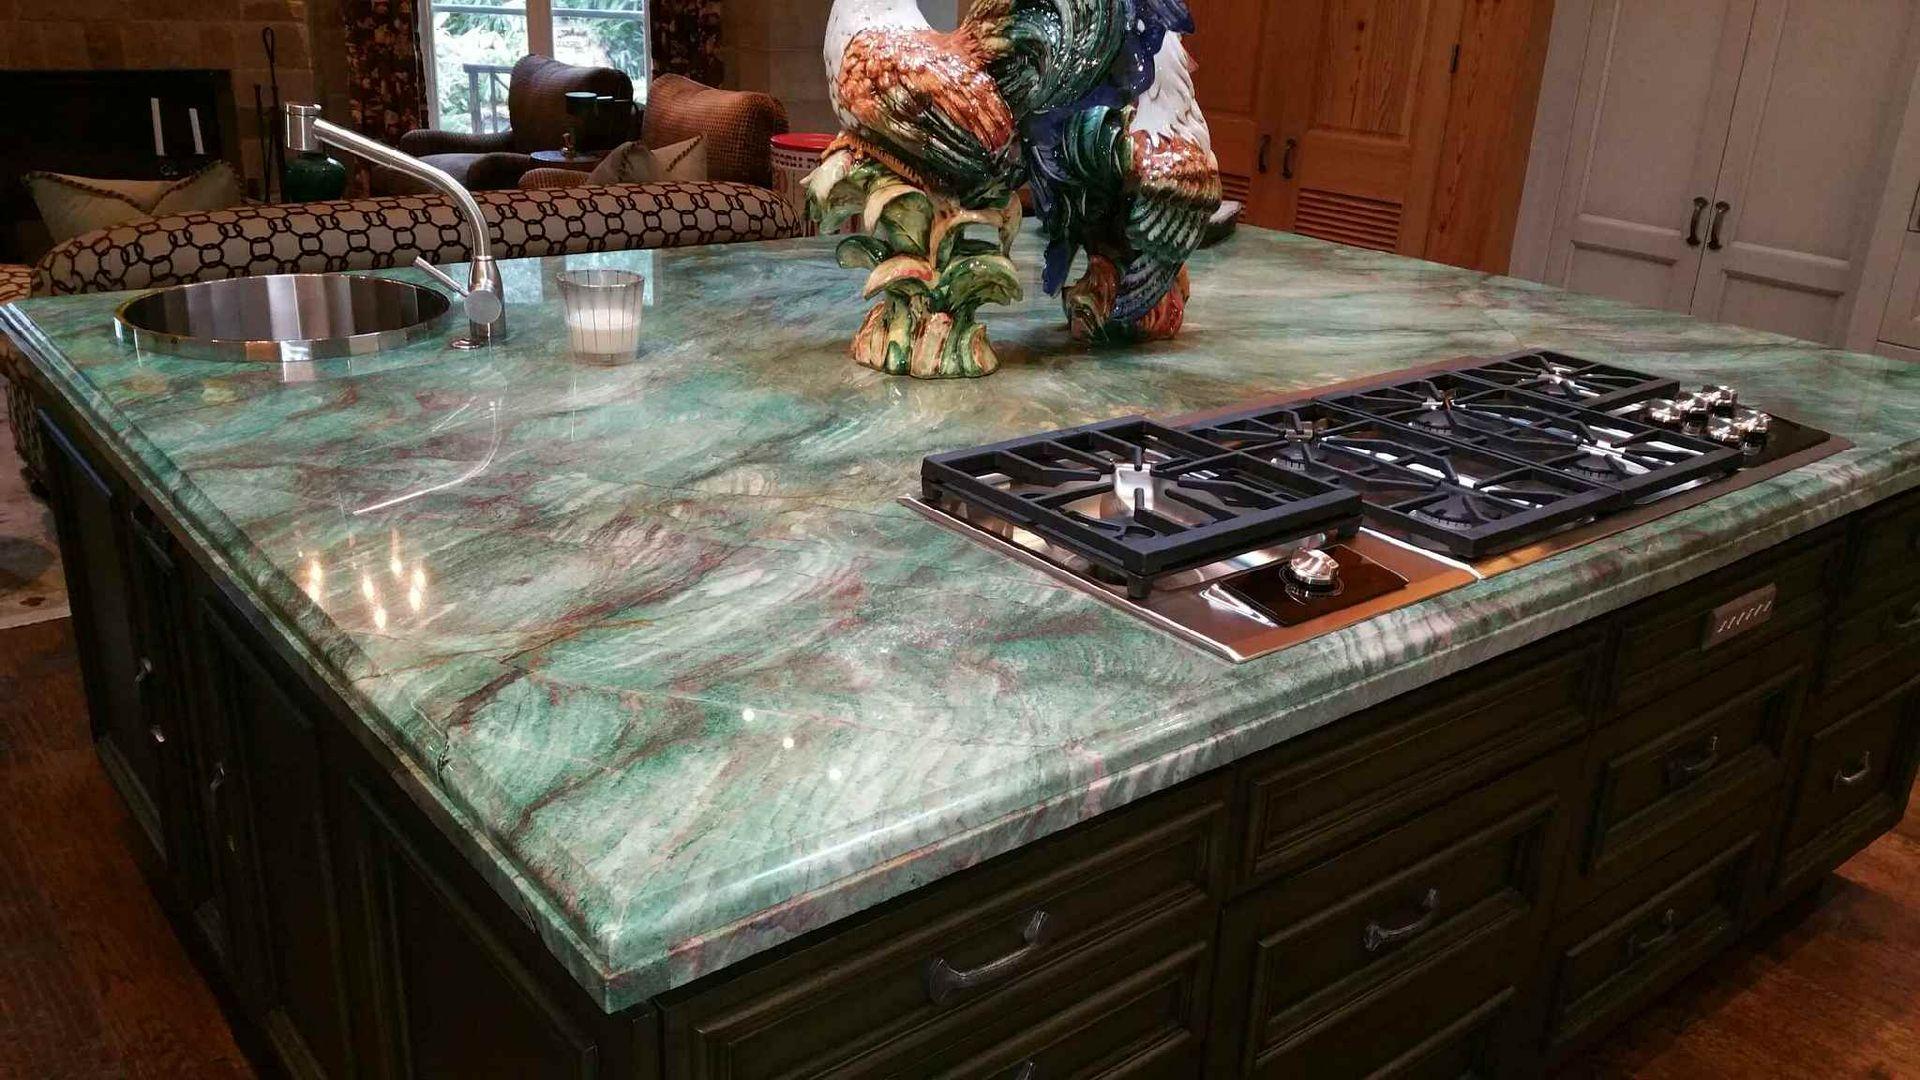 tile laminate sapphire beveled reverse travertine granite cabinet countertop countertops bevel x blue trim ambe inch edge half double walnut quartz